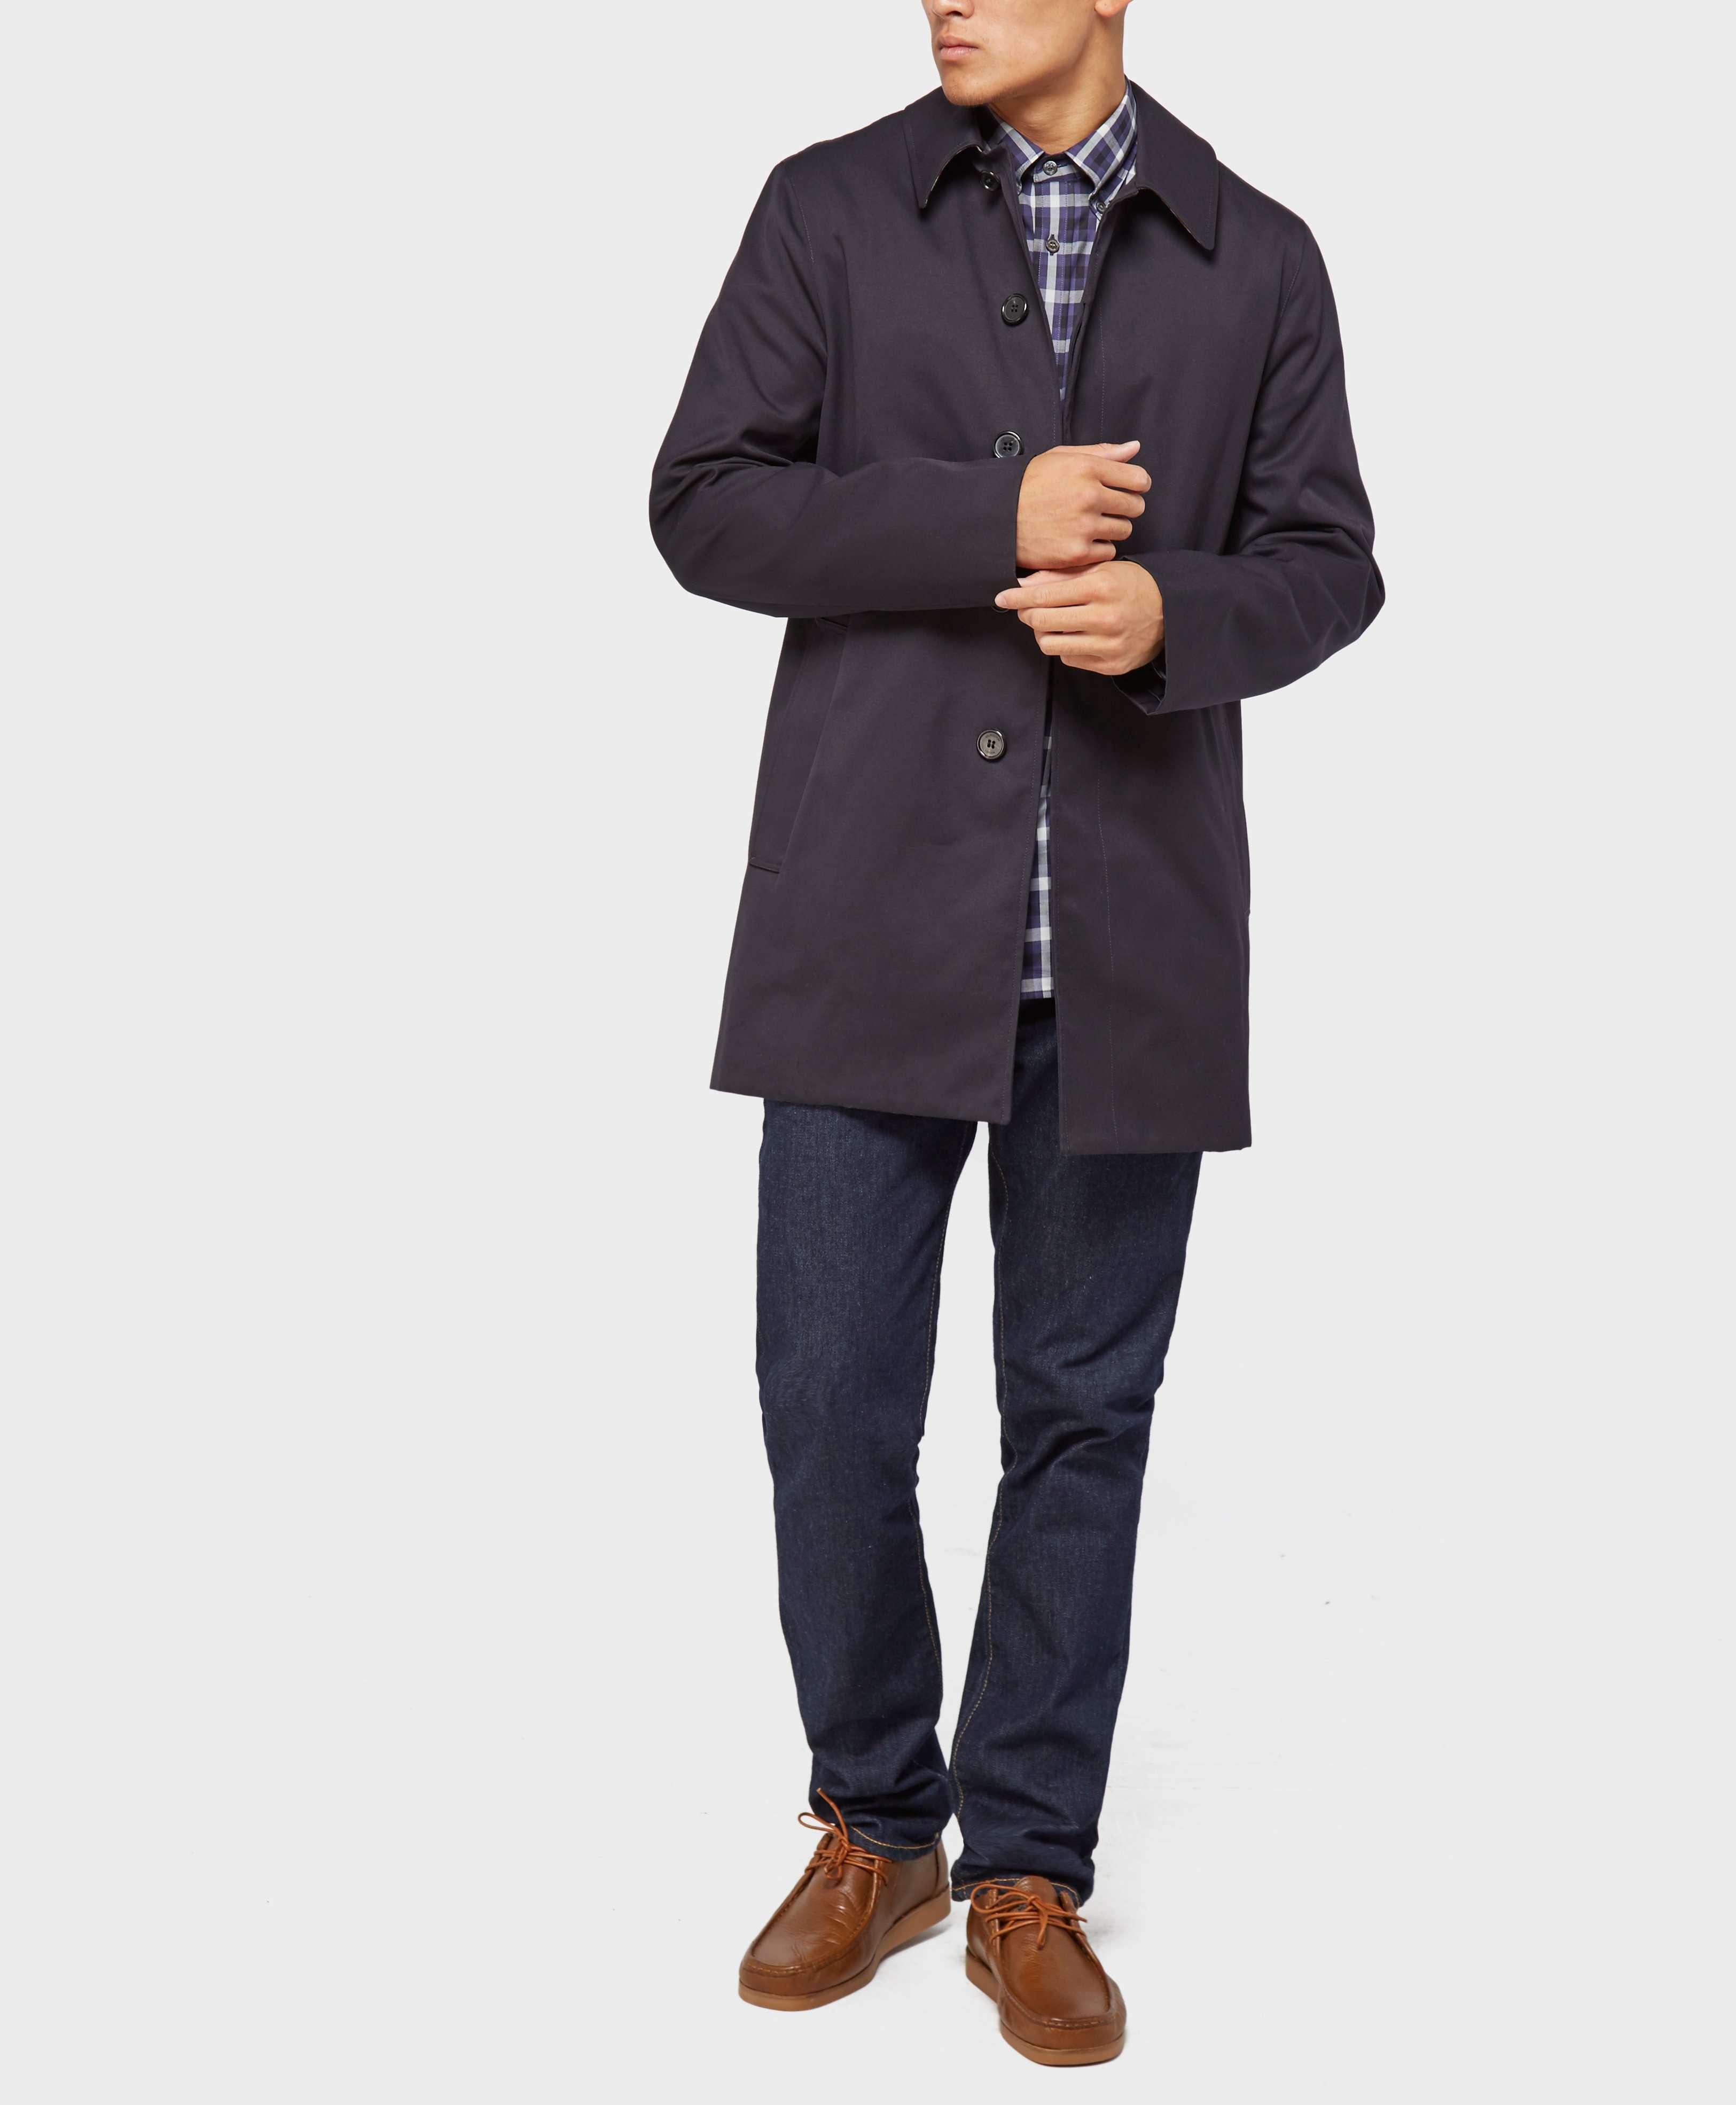 Aquascutum Berkeley Lightweight Trench Coat